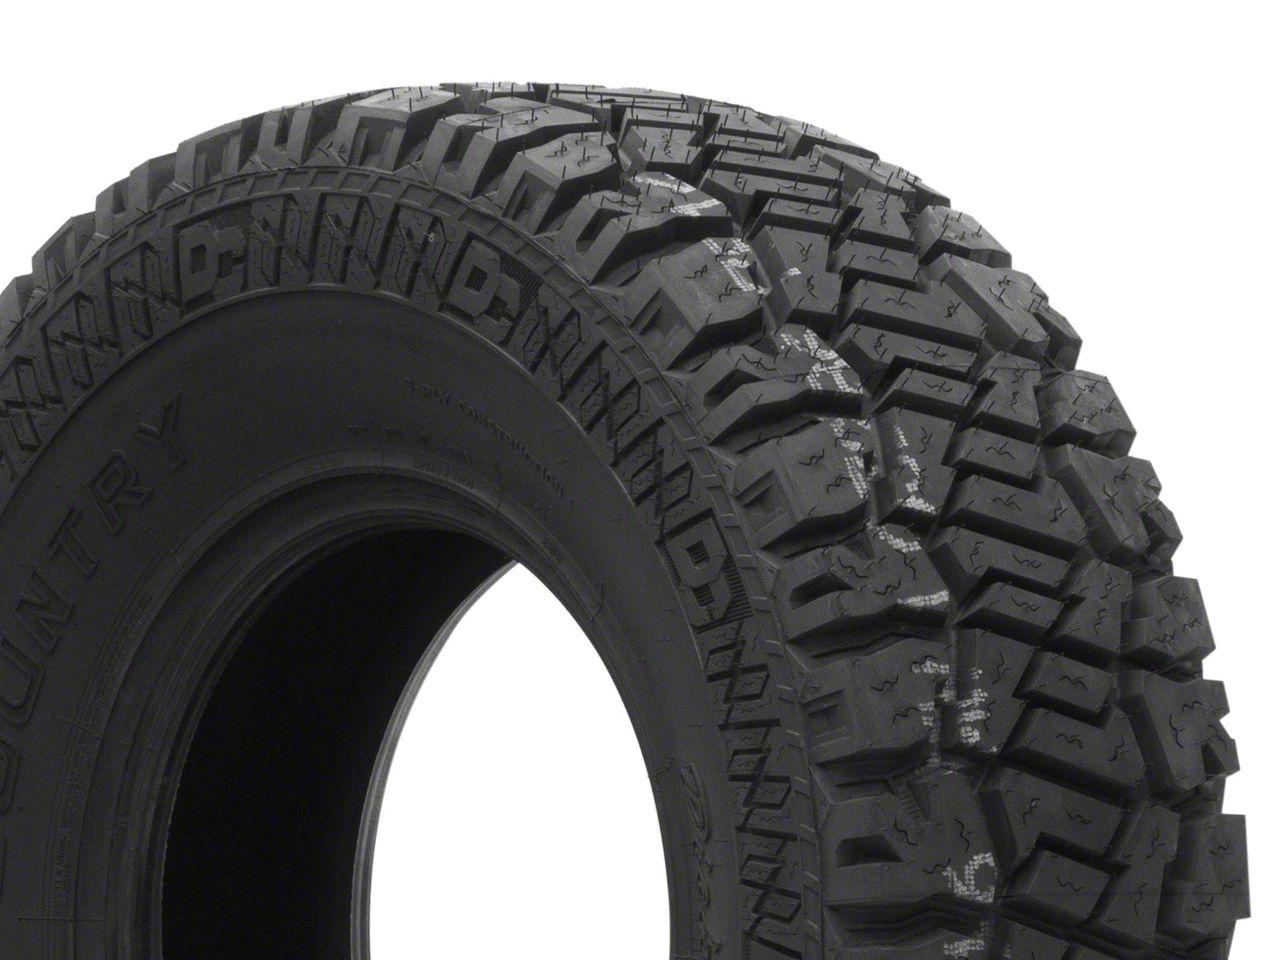 Dick Cepek Fun Country Tire - 33X12.50R15